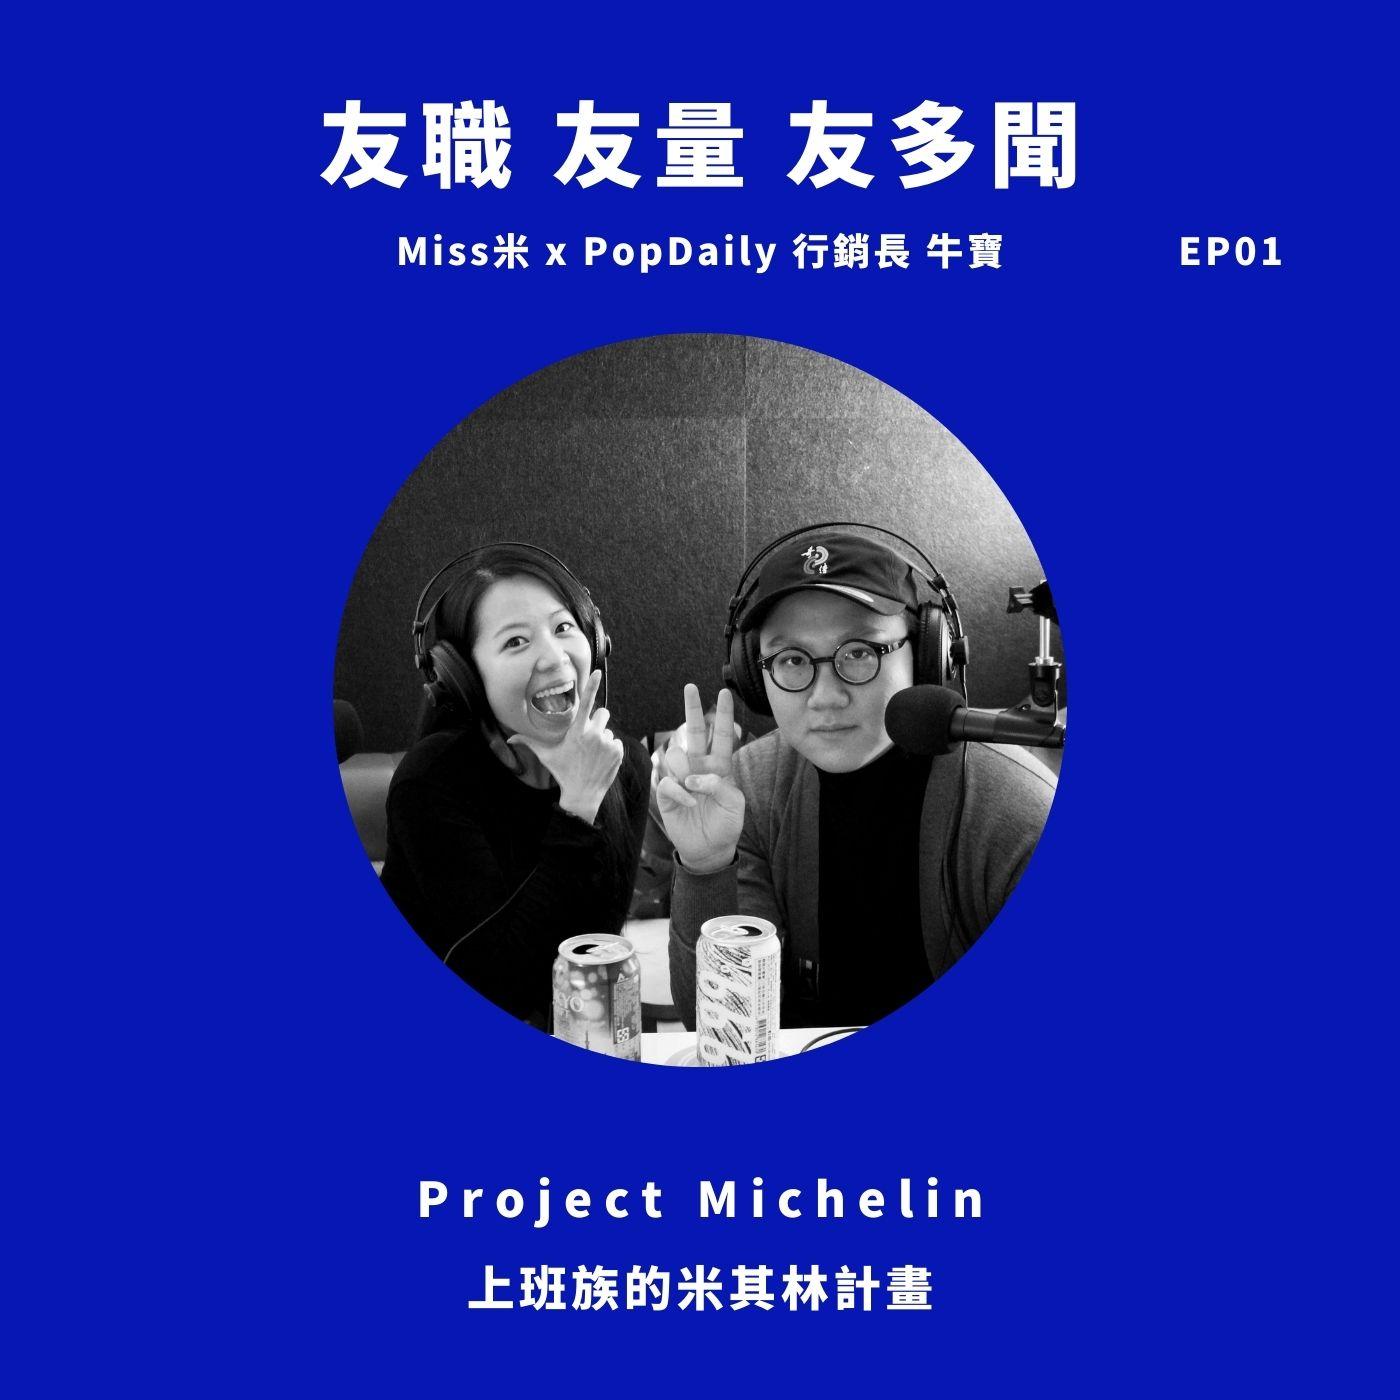 EP01 PopDaily 行銷長牛寶 x 行銷失敗經驗 x 餐廳推薦